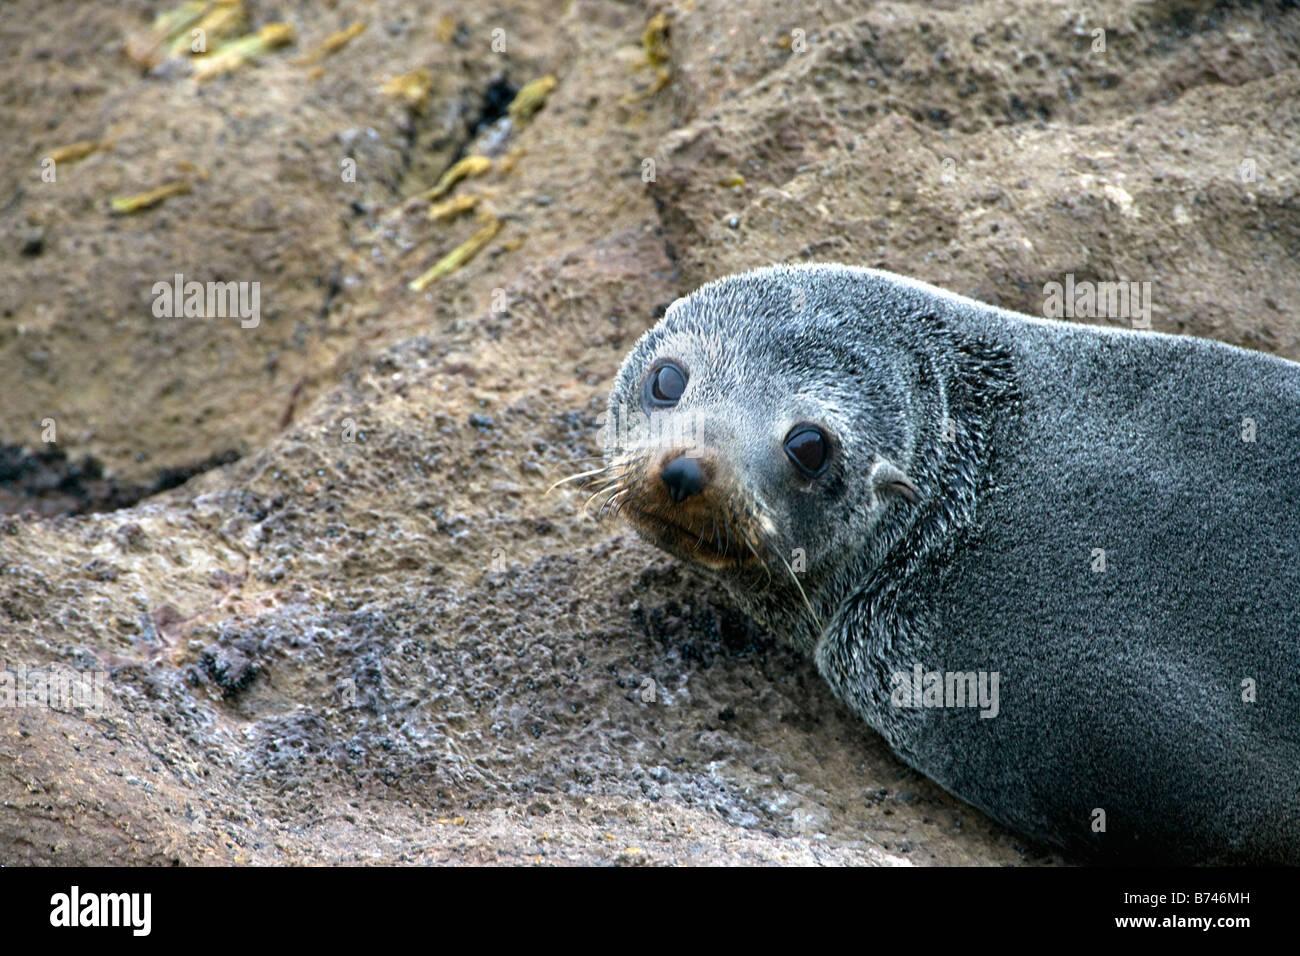 New Zealand, South Island, Dunedin, Otago Peninsula, Australasian Fur Seal (Arctocephalus fosteri), or Southern - Stock Image